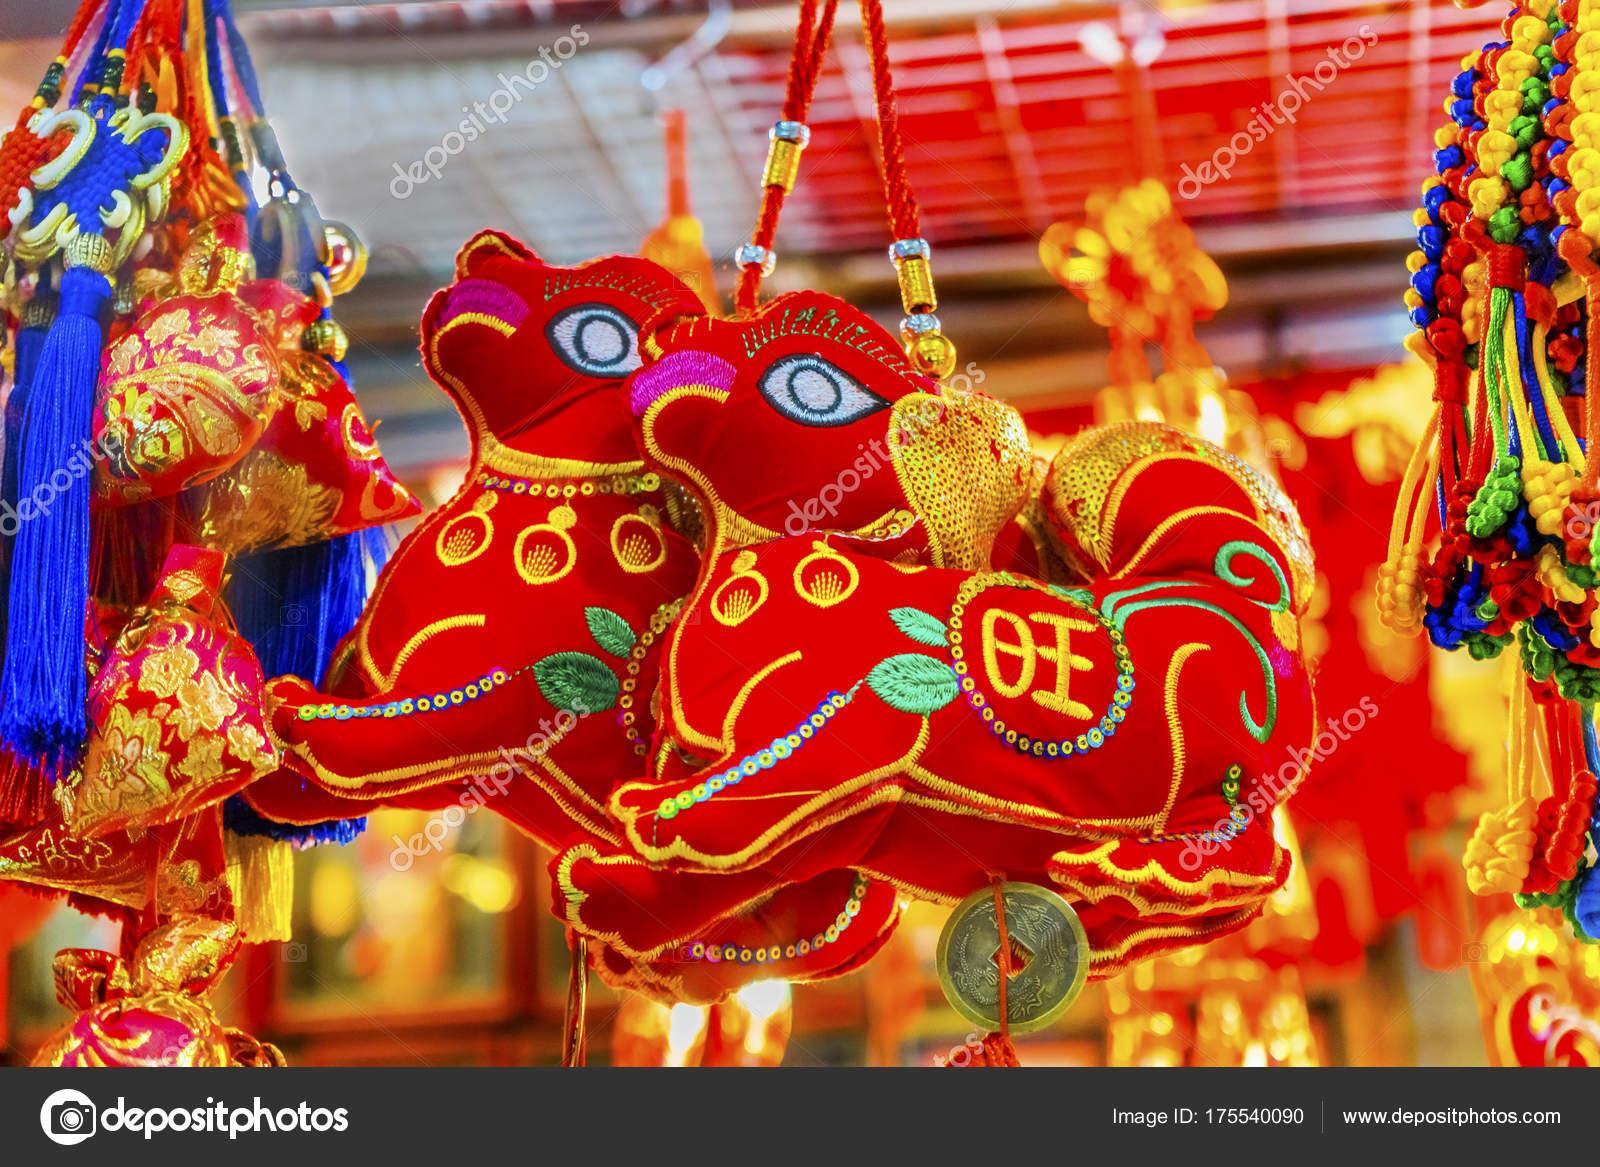 Roten alten Hunden Chinese Lunar New Year Dekorationen Peking China ...